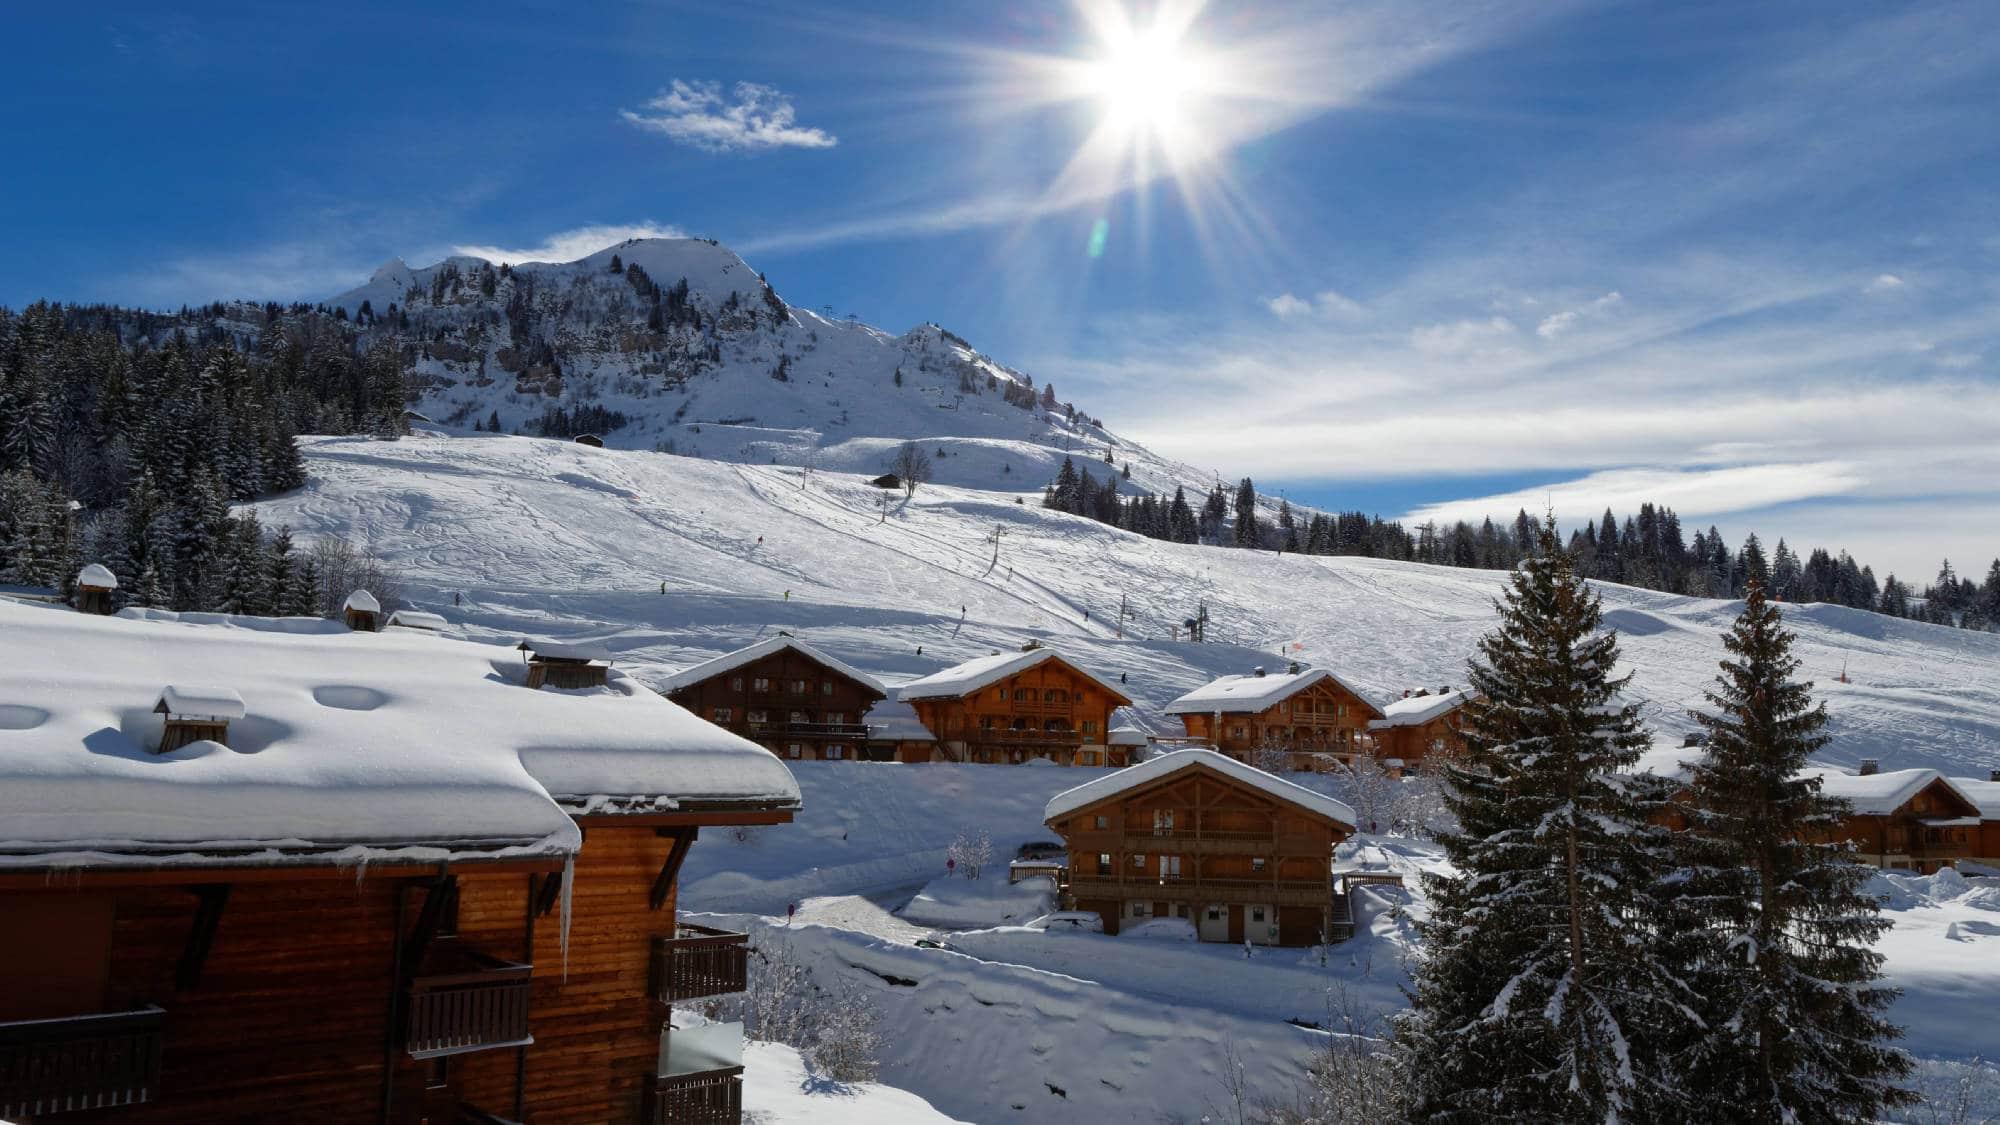 Pistes de ski du Chinaillon au Grand Bornand